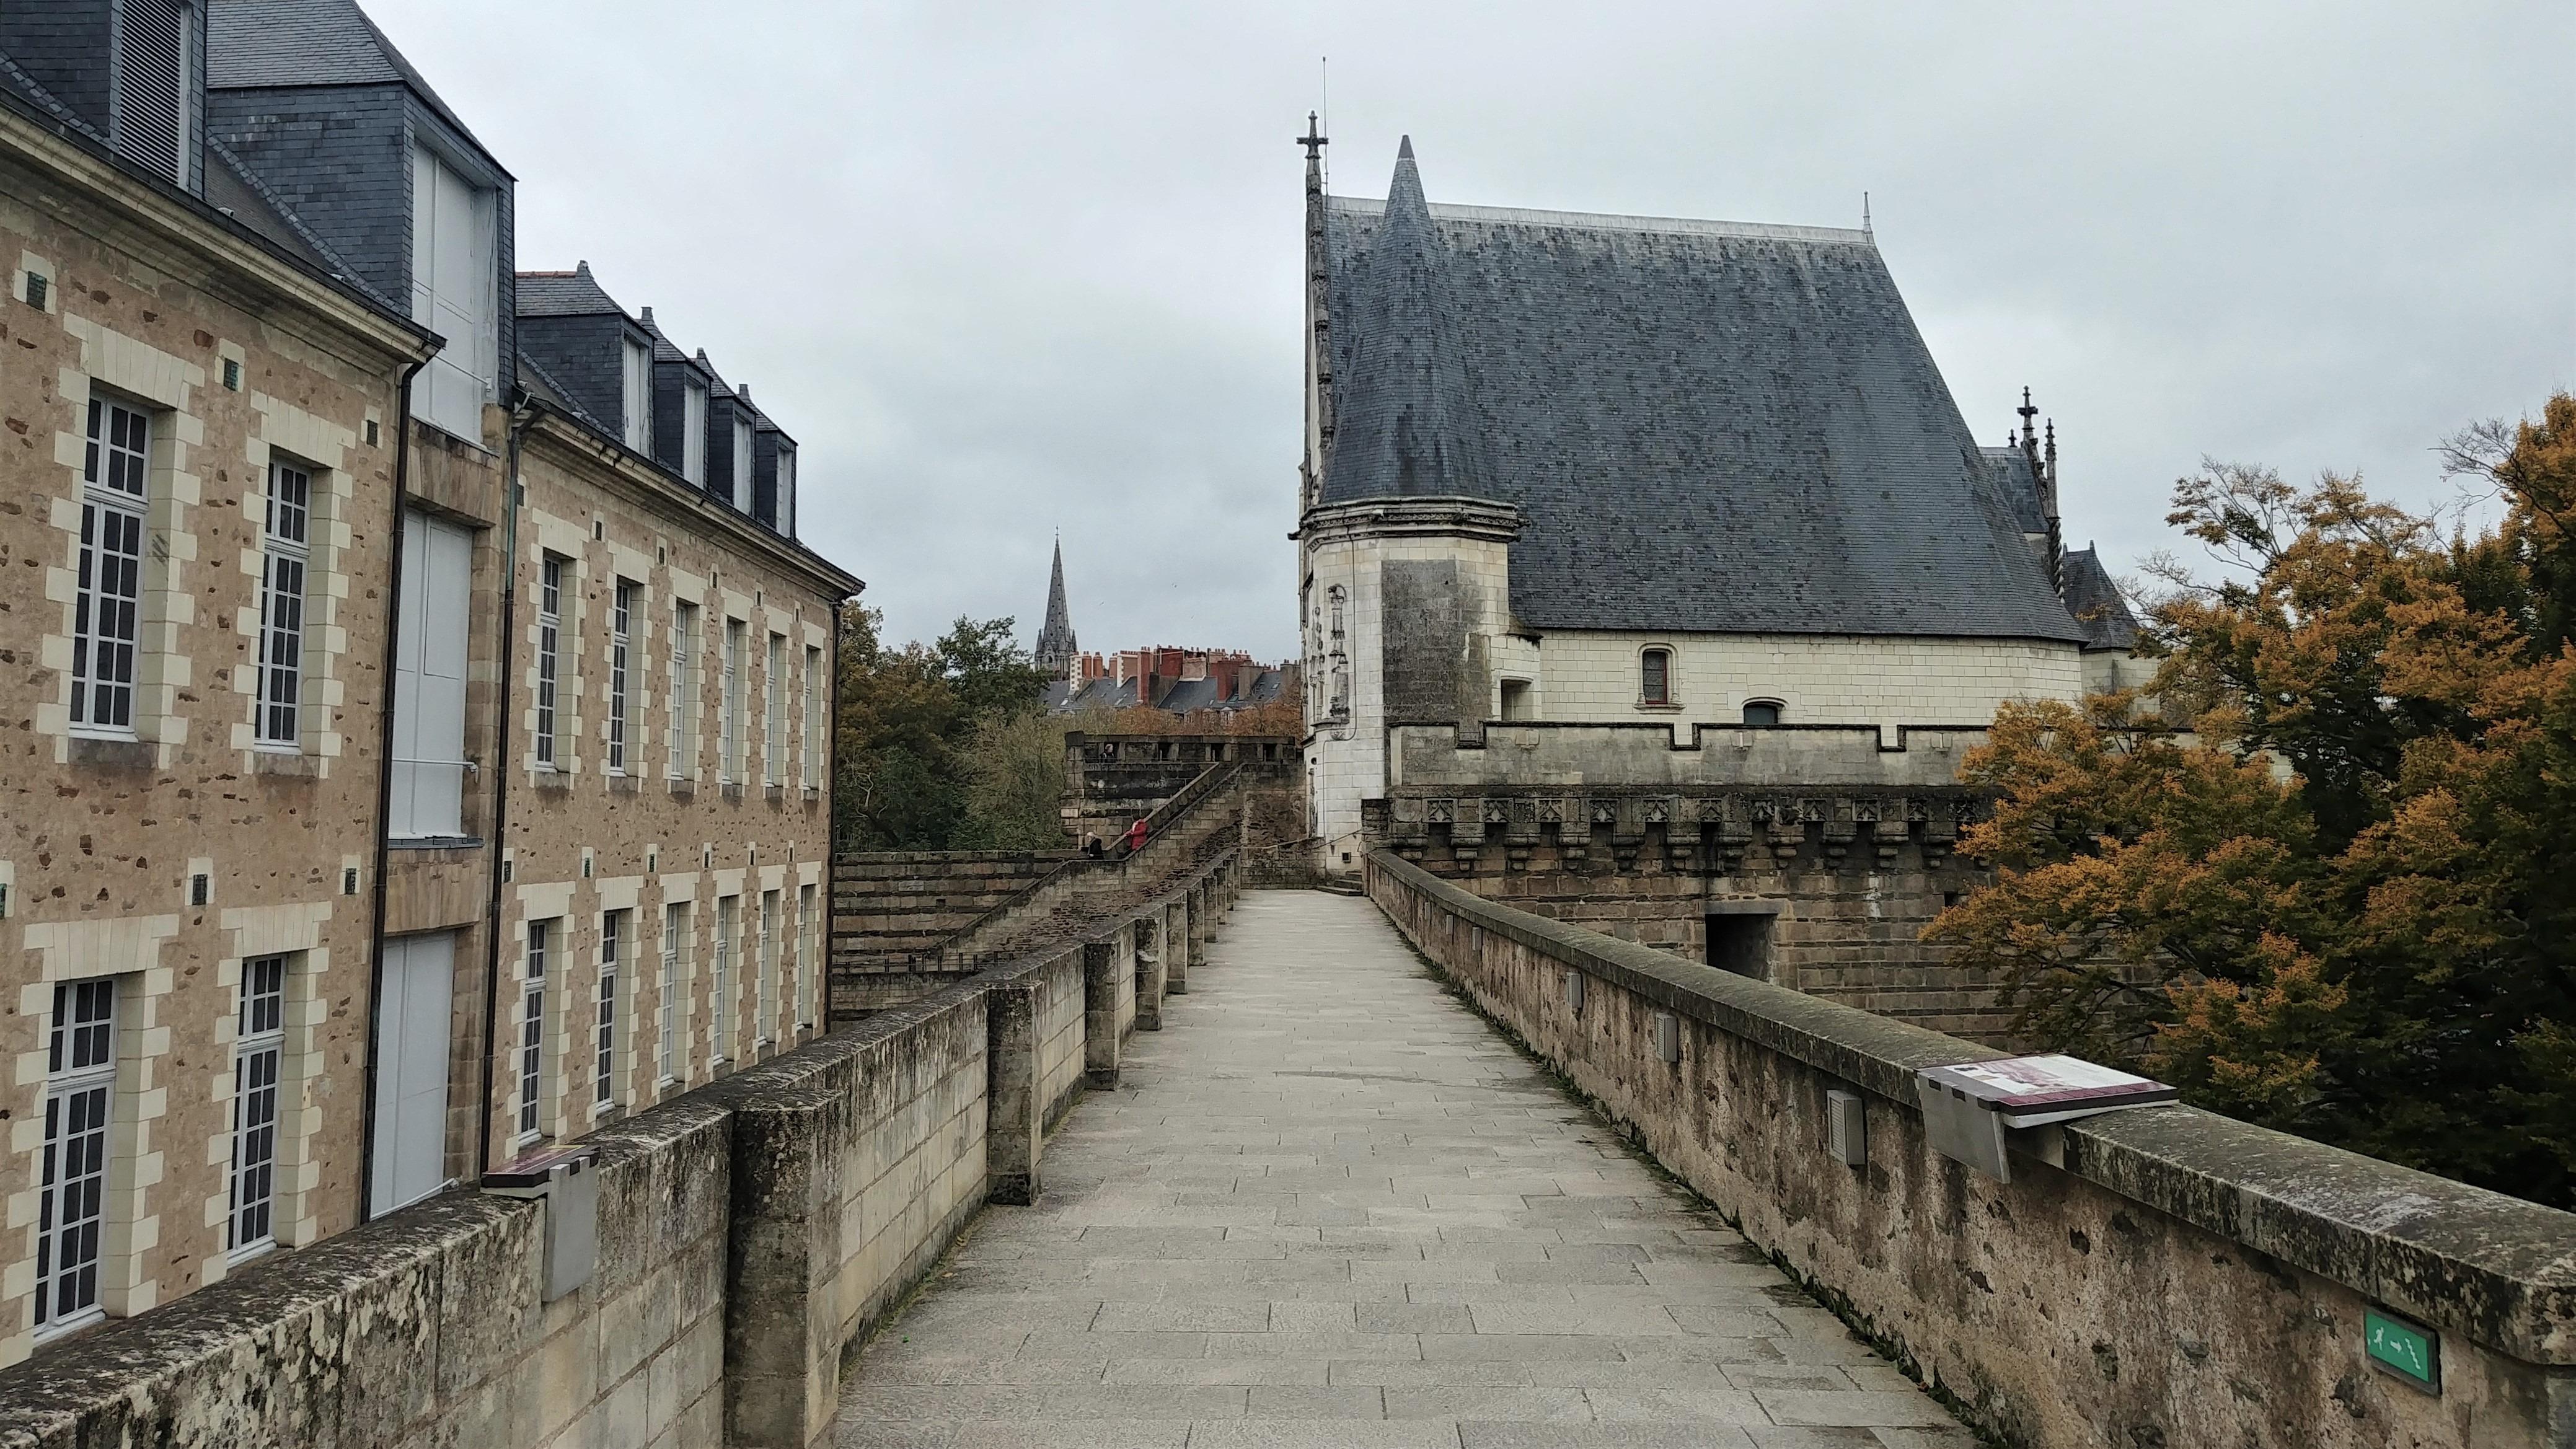 nantes visiter chateau anne bretagne infos pratiques musee blog voyage france arpenter le chemin